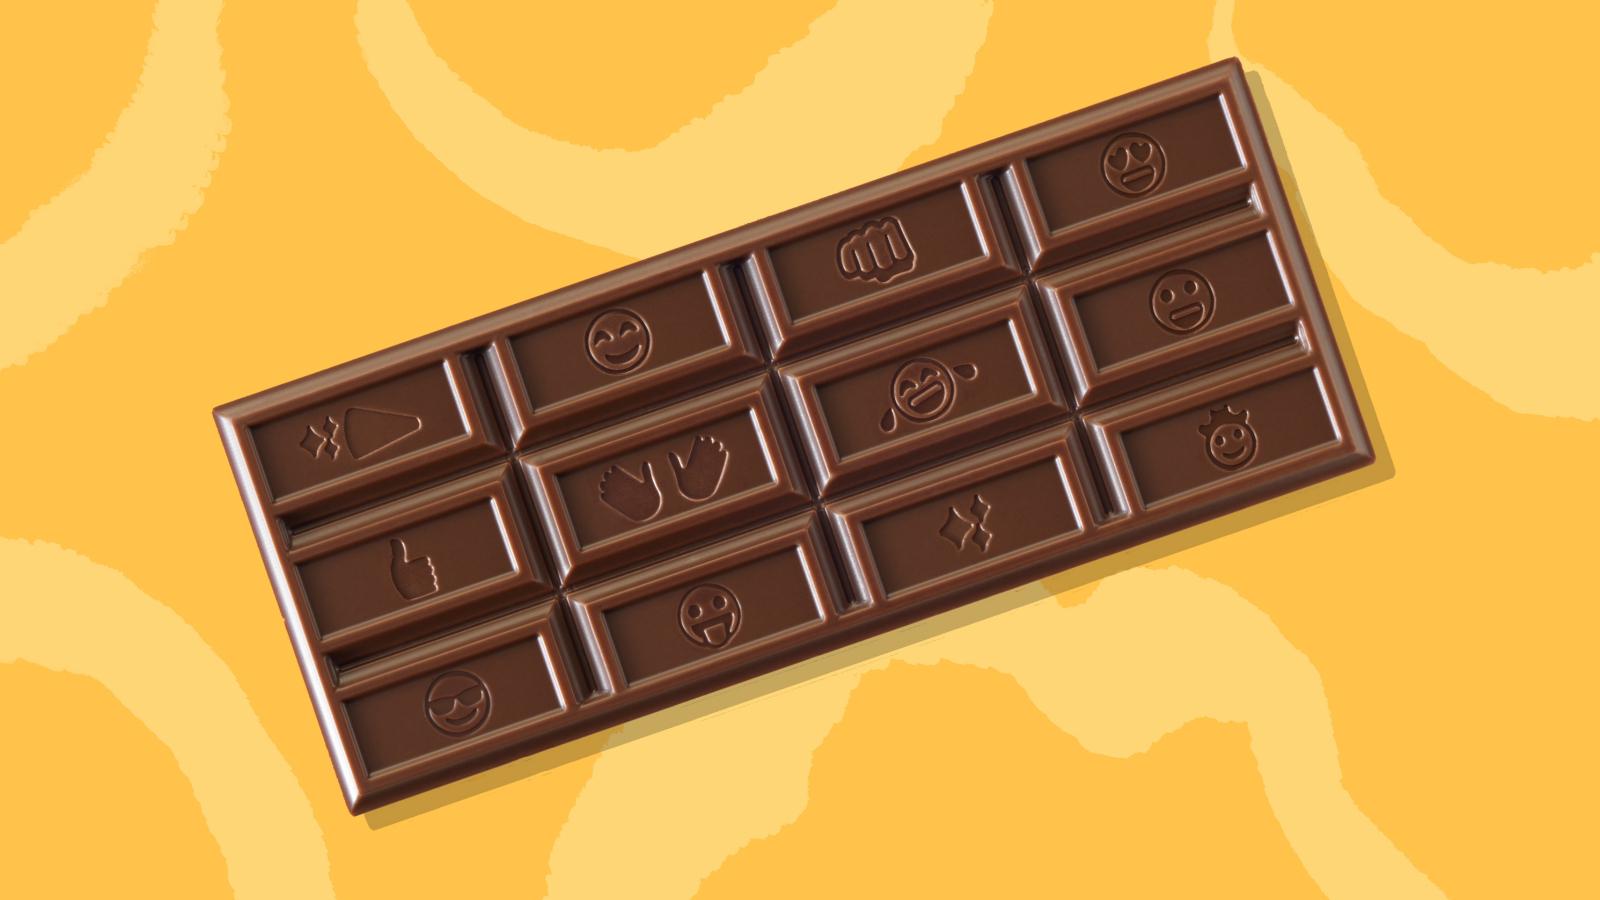 new milky bar chocolate - 1040×657